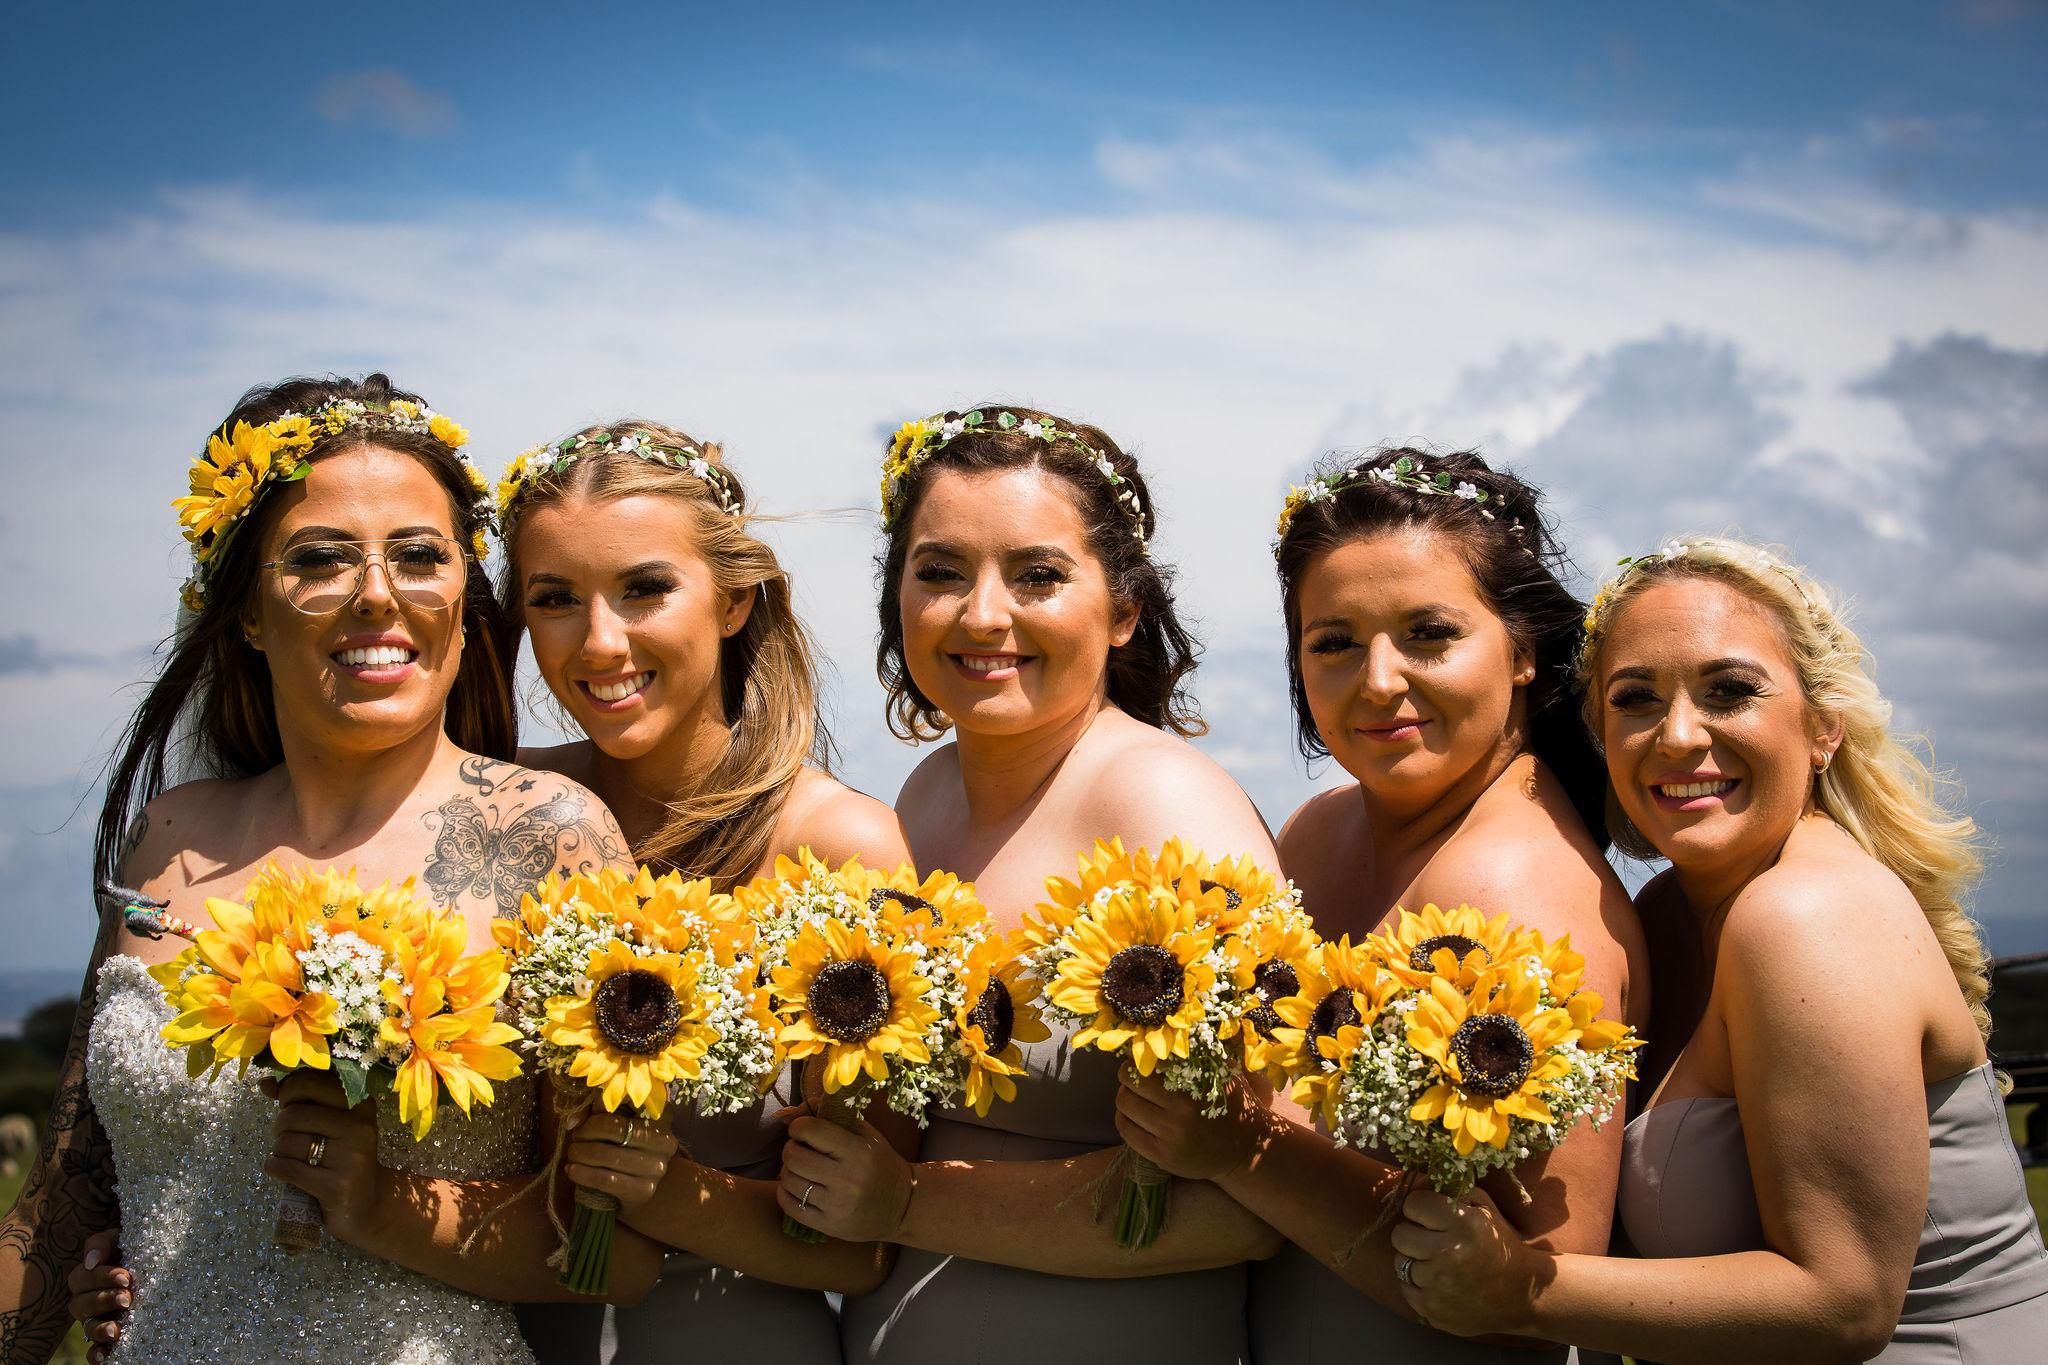 Harriet&Rhys Wedding - Magical sunflower wedding - quirky wedding with dodgems (49)